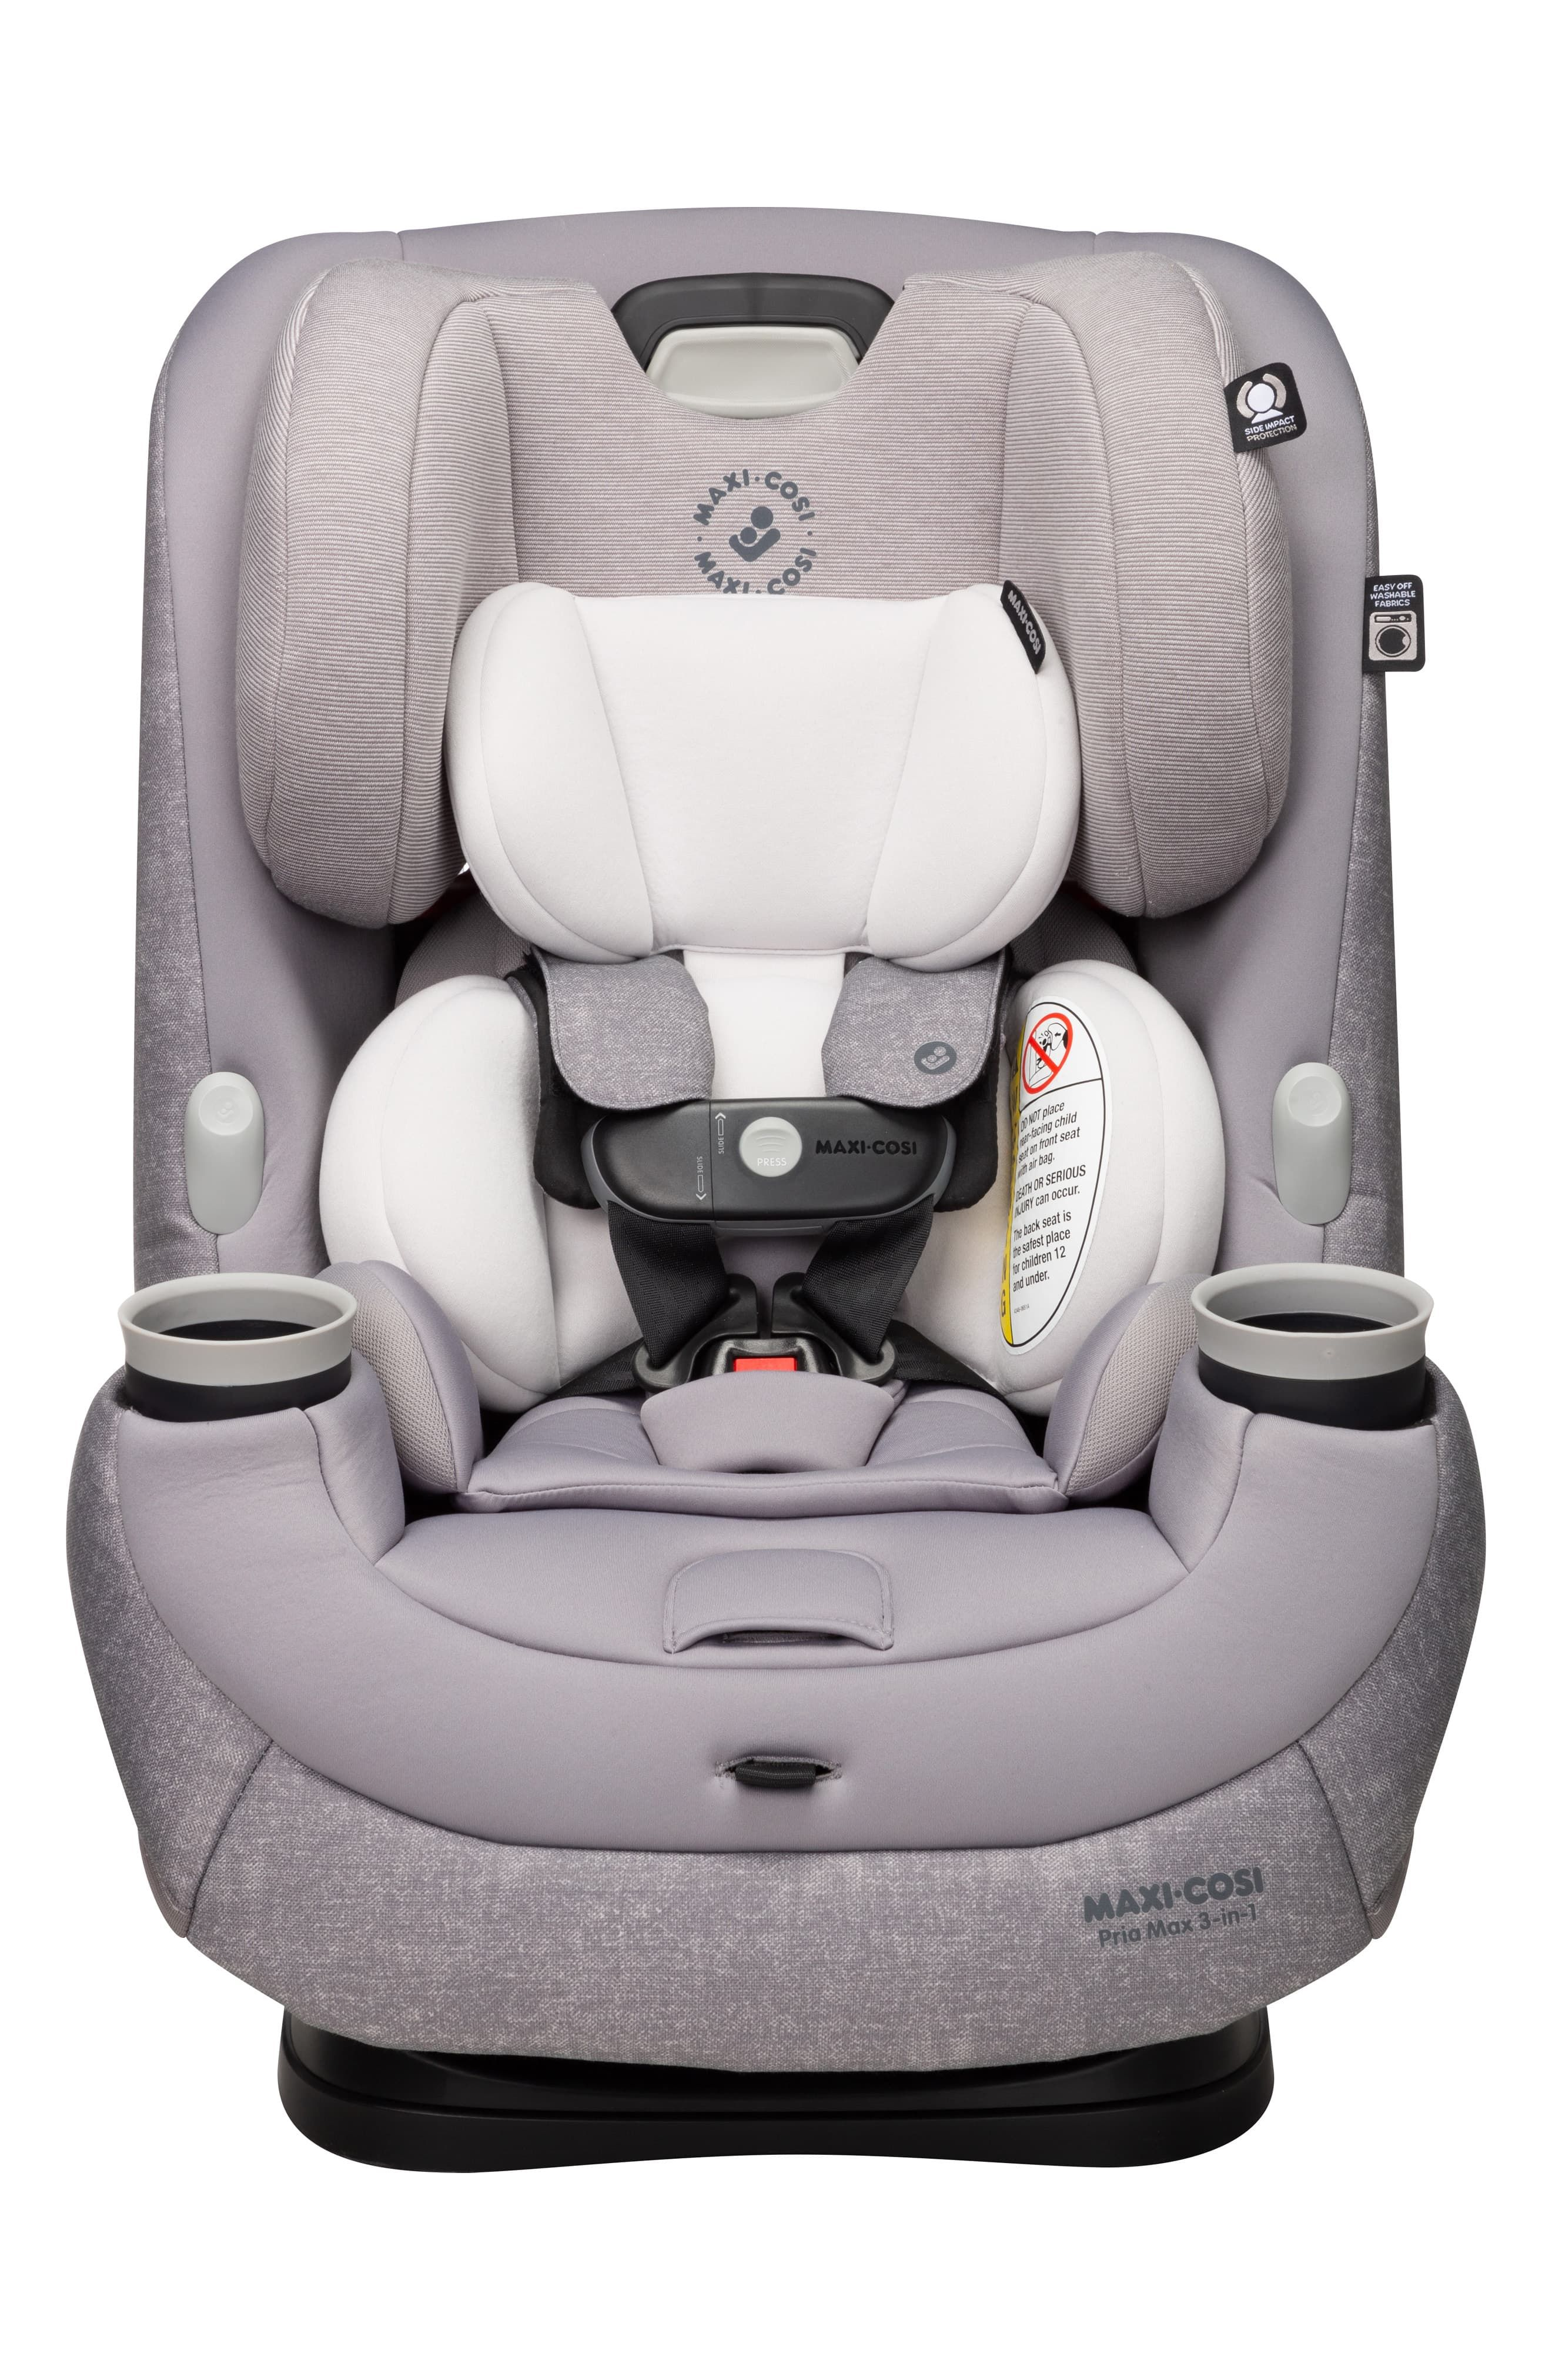 6ecee82d74280408e87266091e40b4ee - How To Get Cover Off Maxi Cosi Car Seat